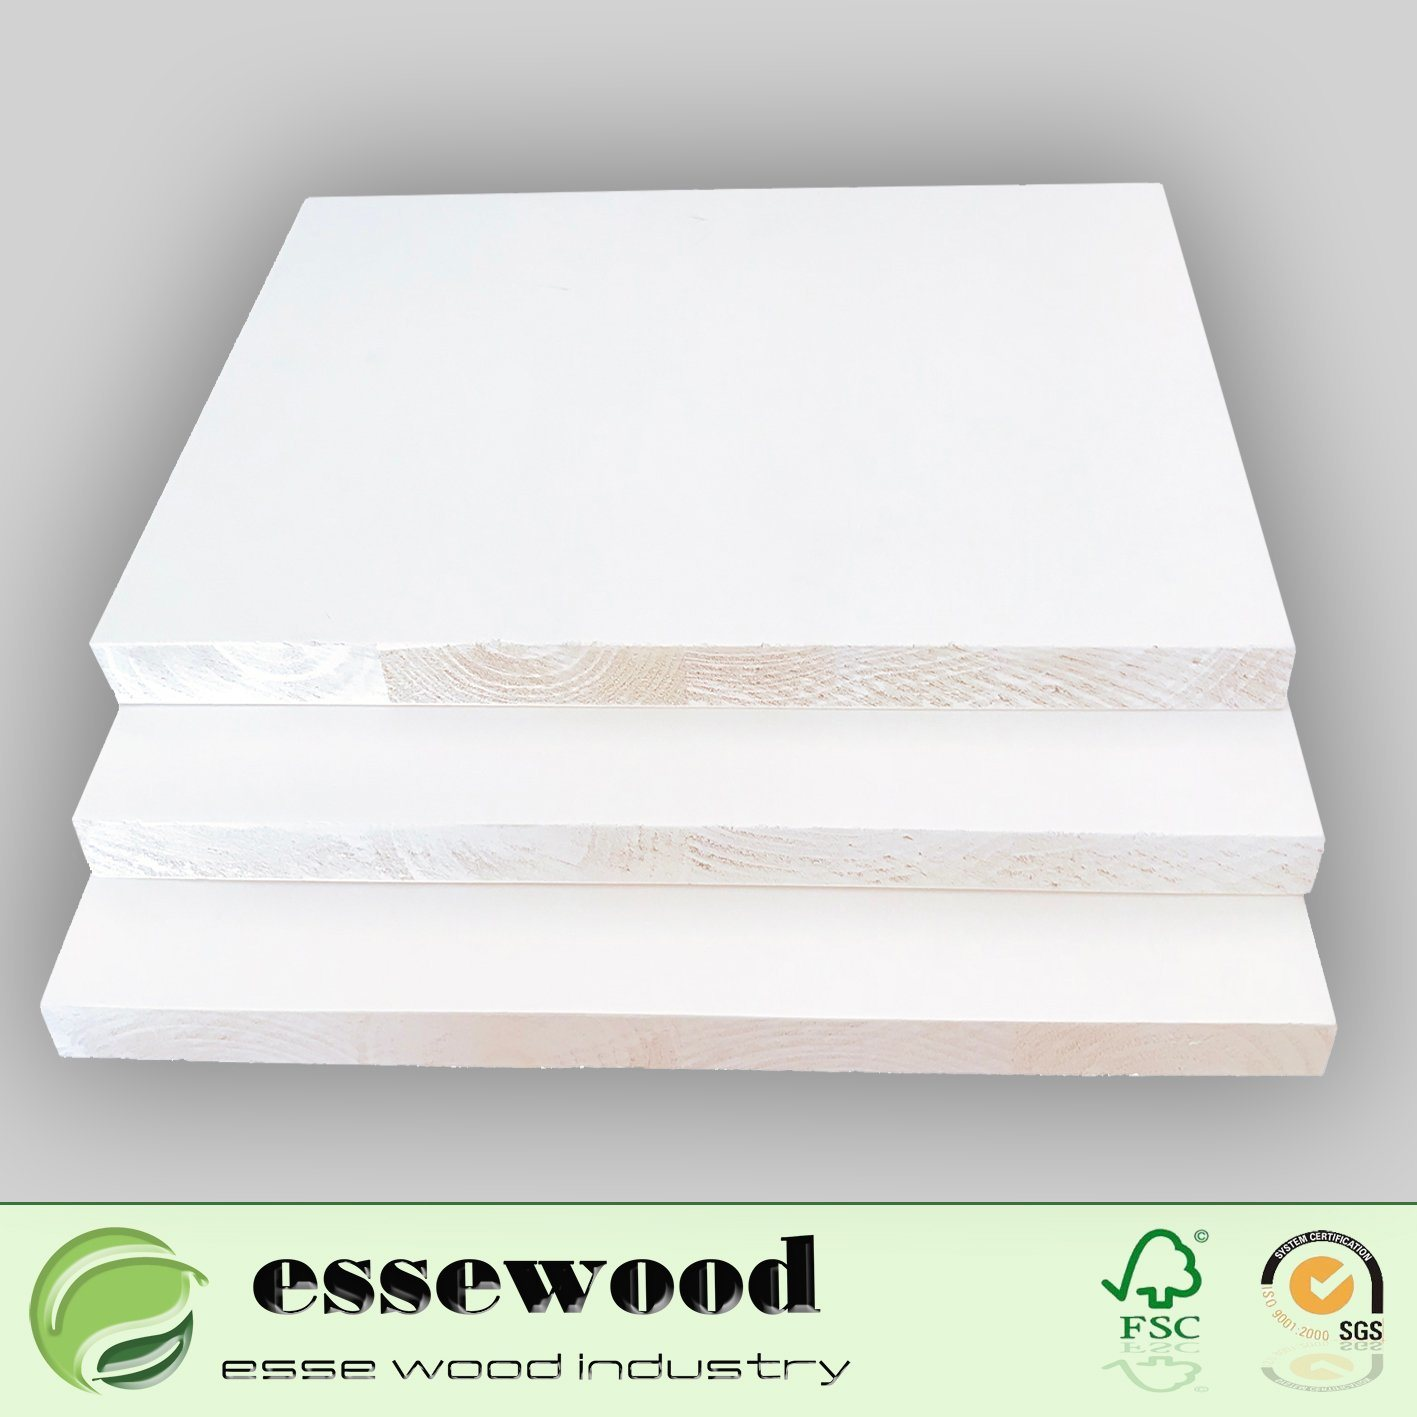 Wood Pine Finger Joint Flat Primed Door Stop Moulding Profile